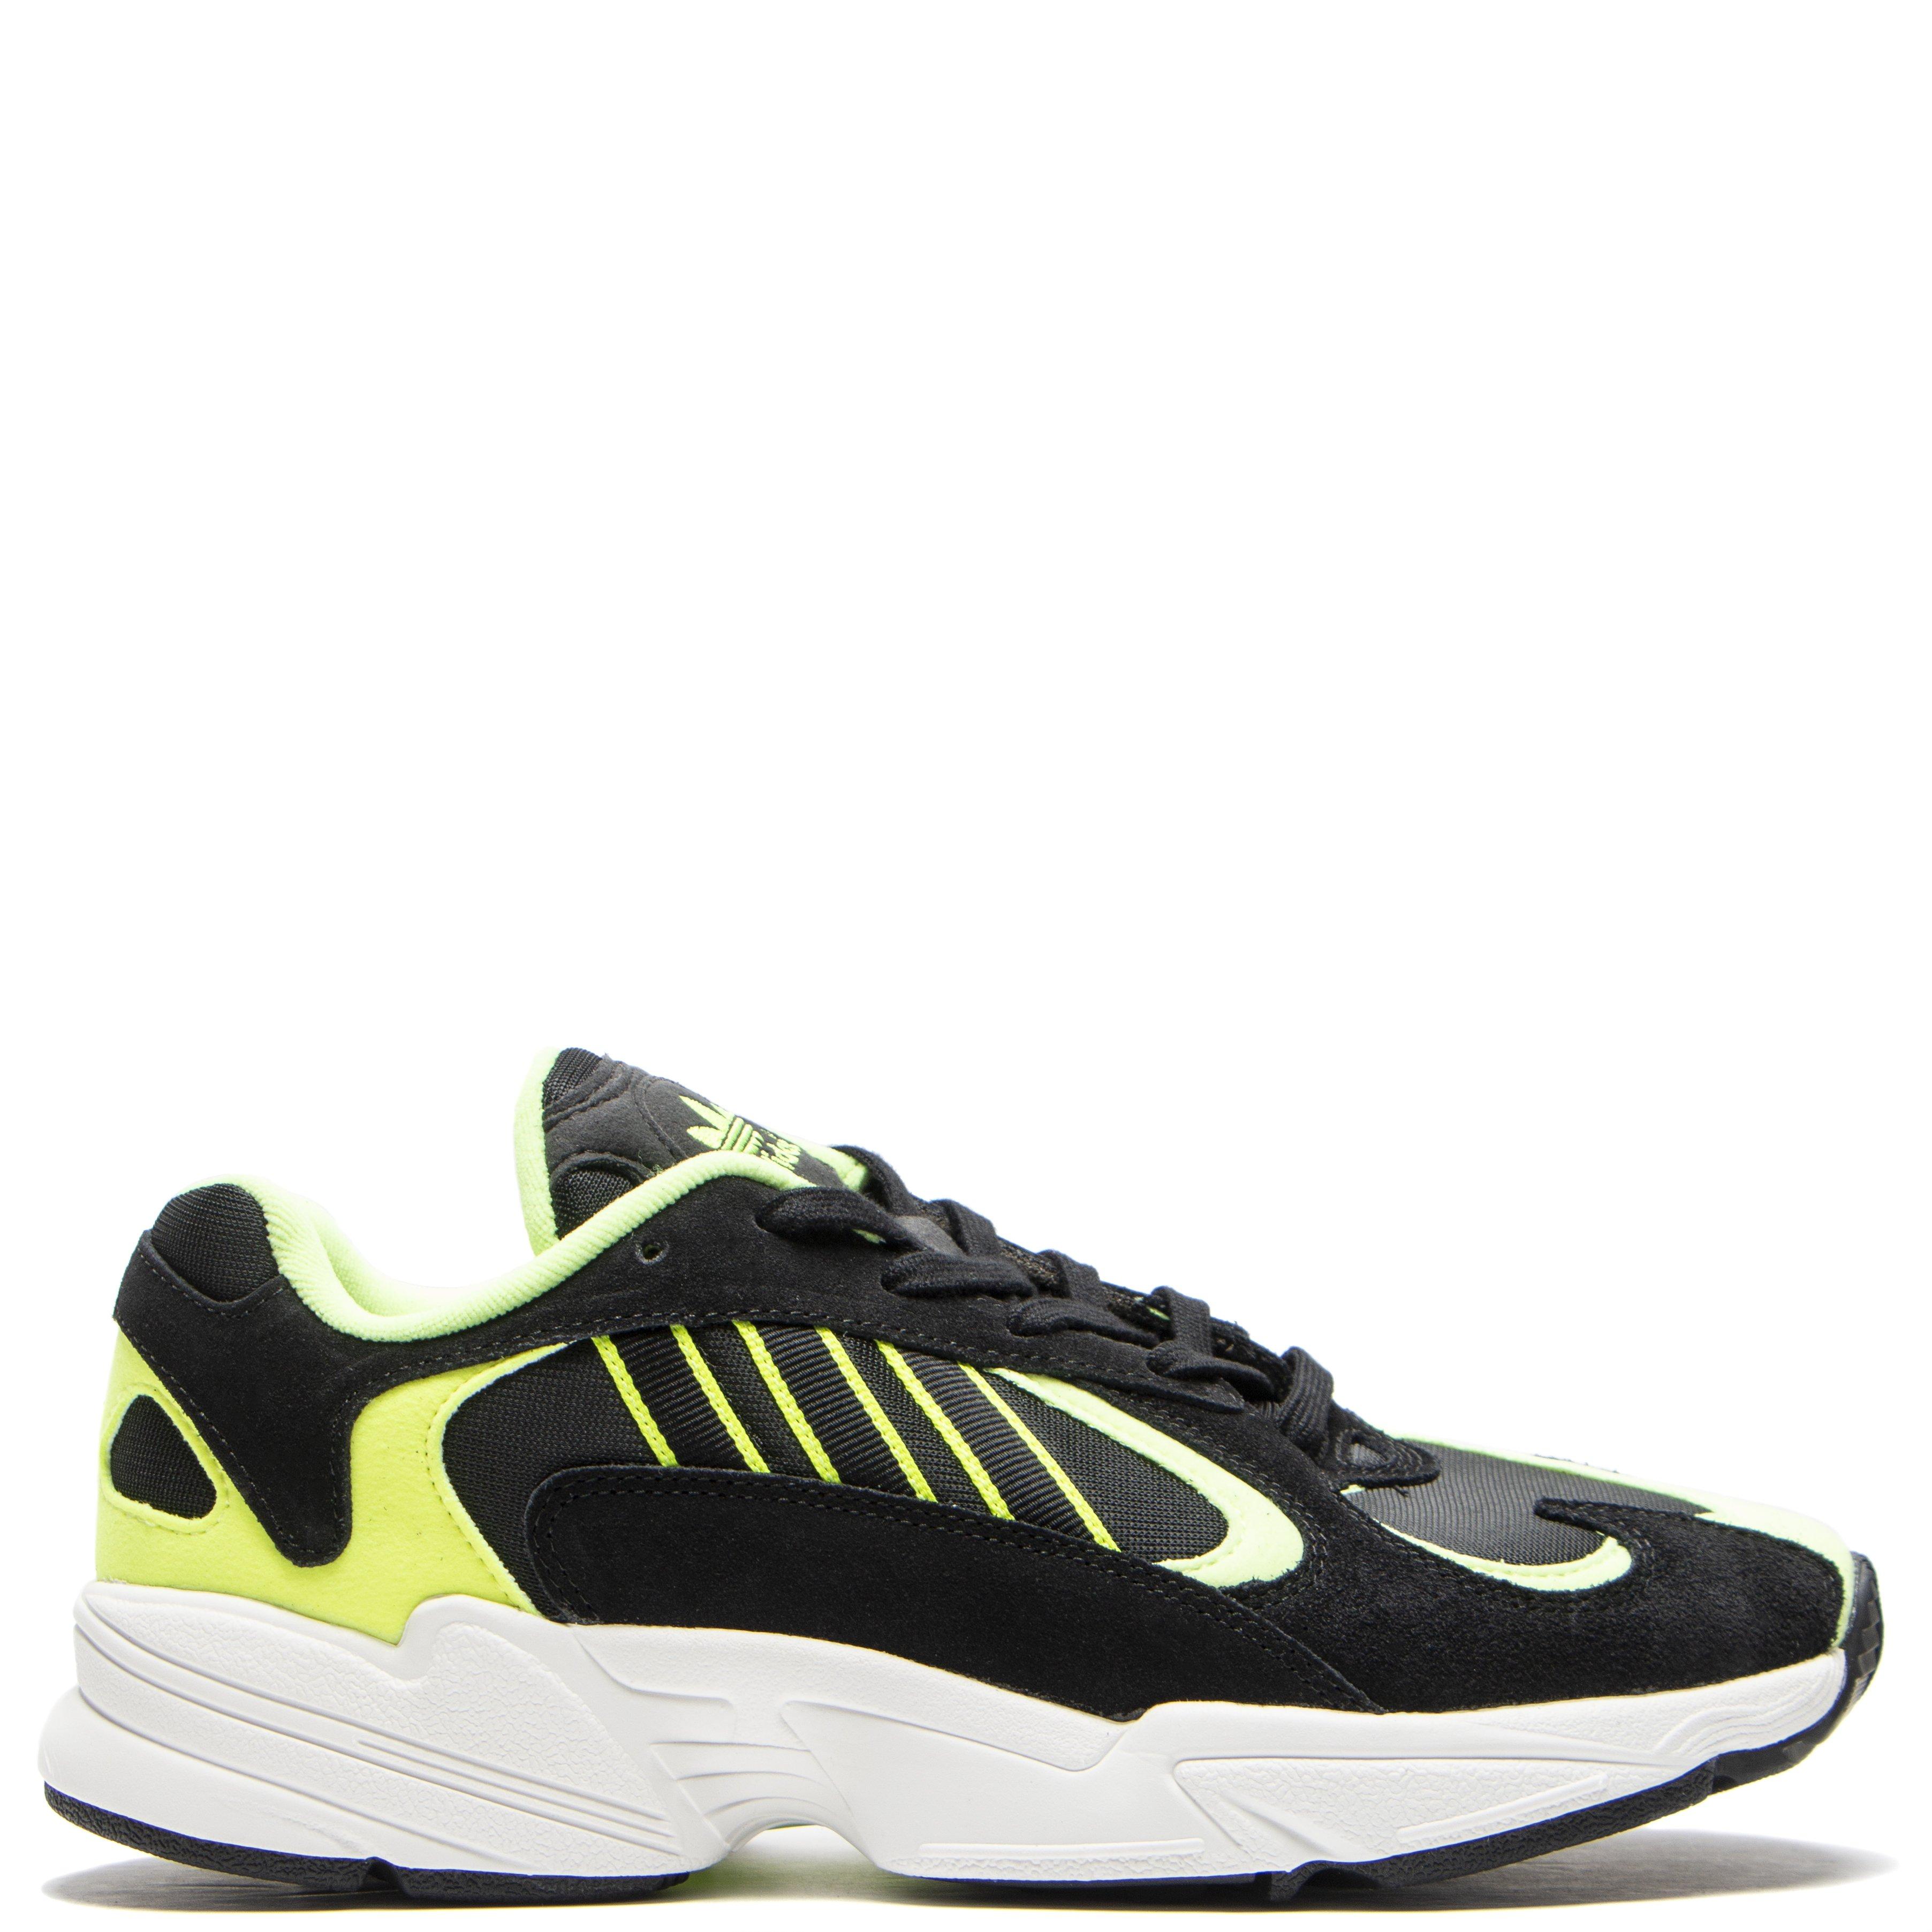 adidas Yung 1 Sneaker Core Black